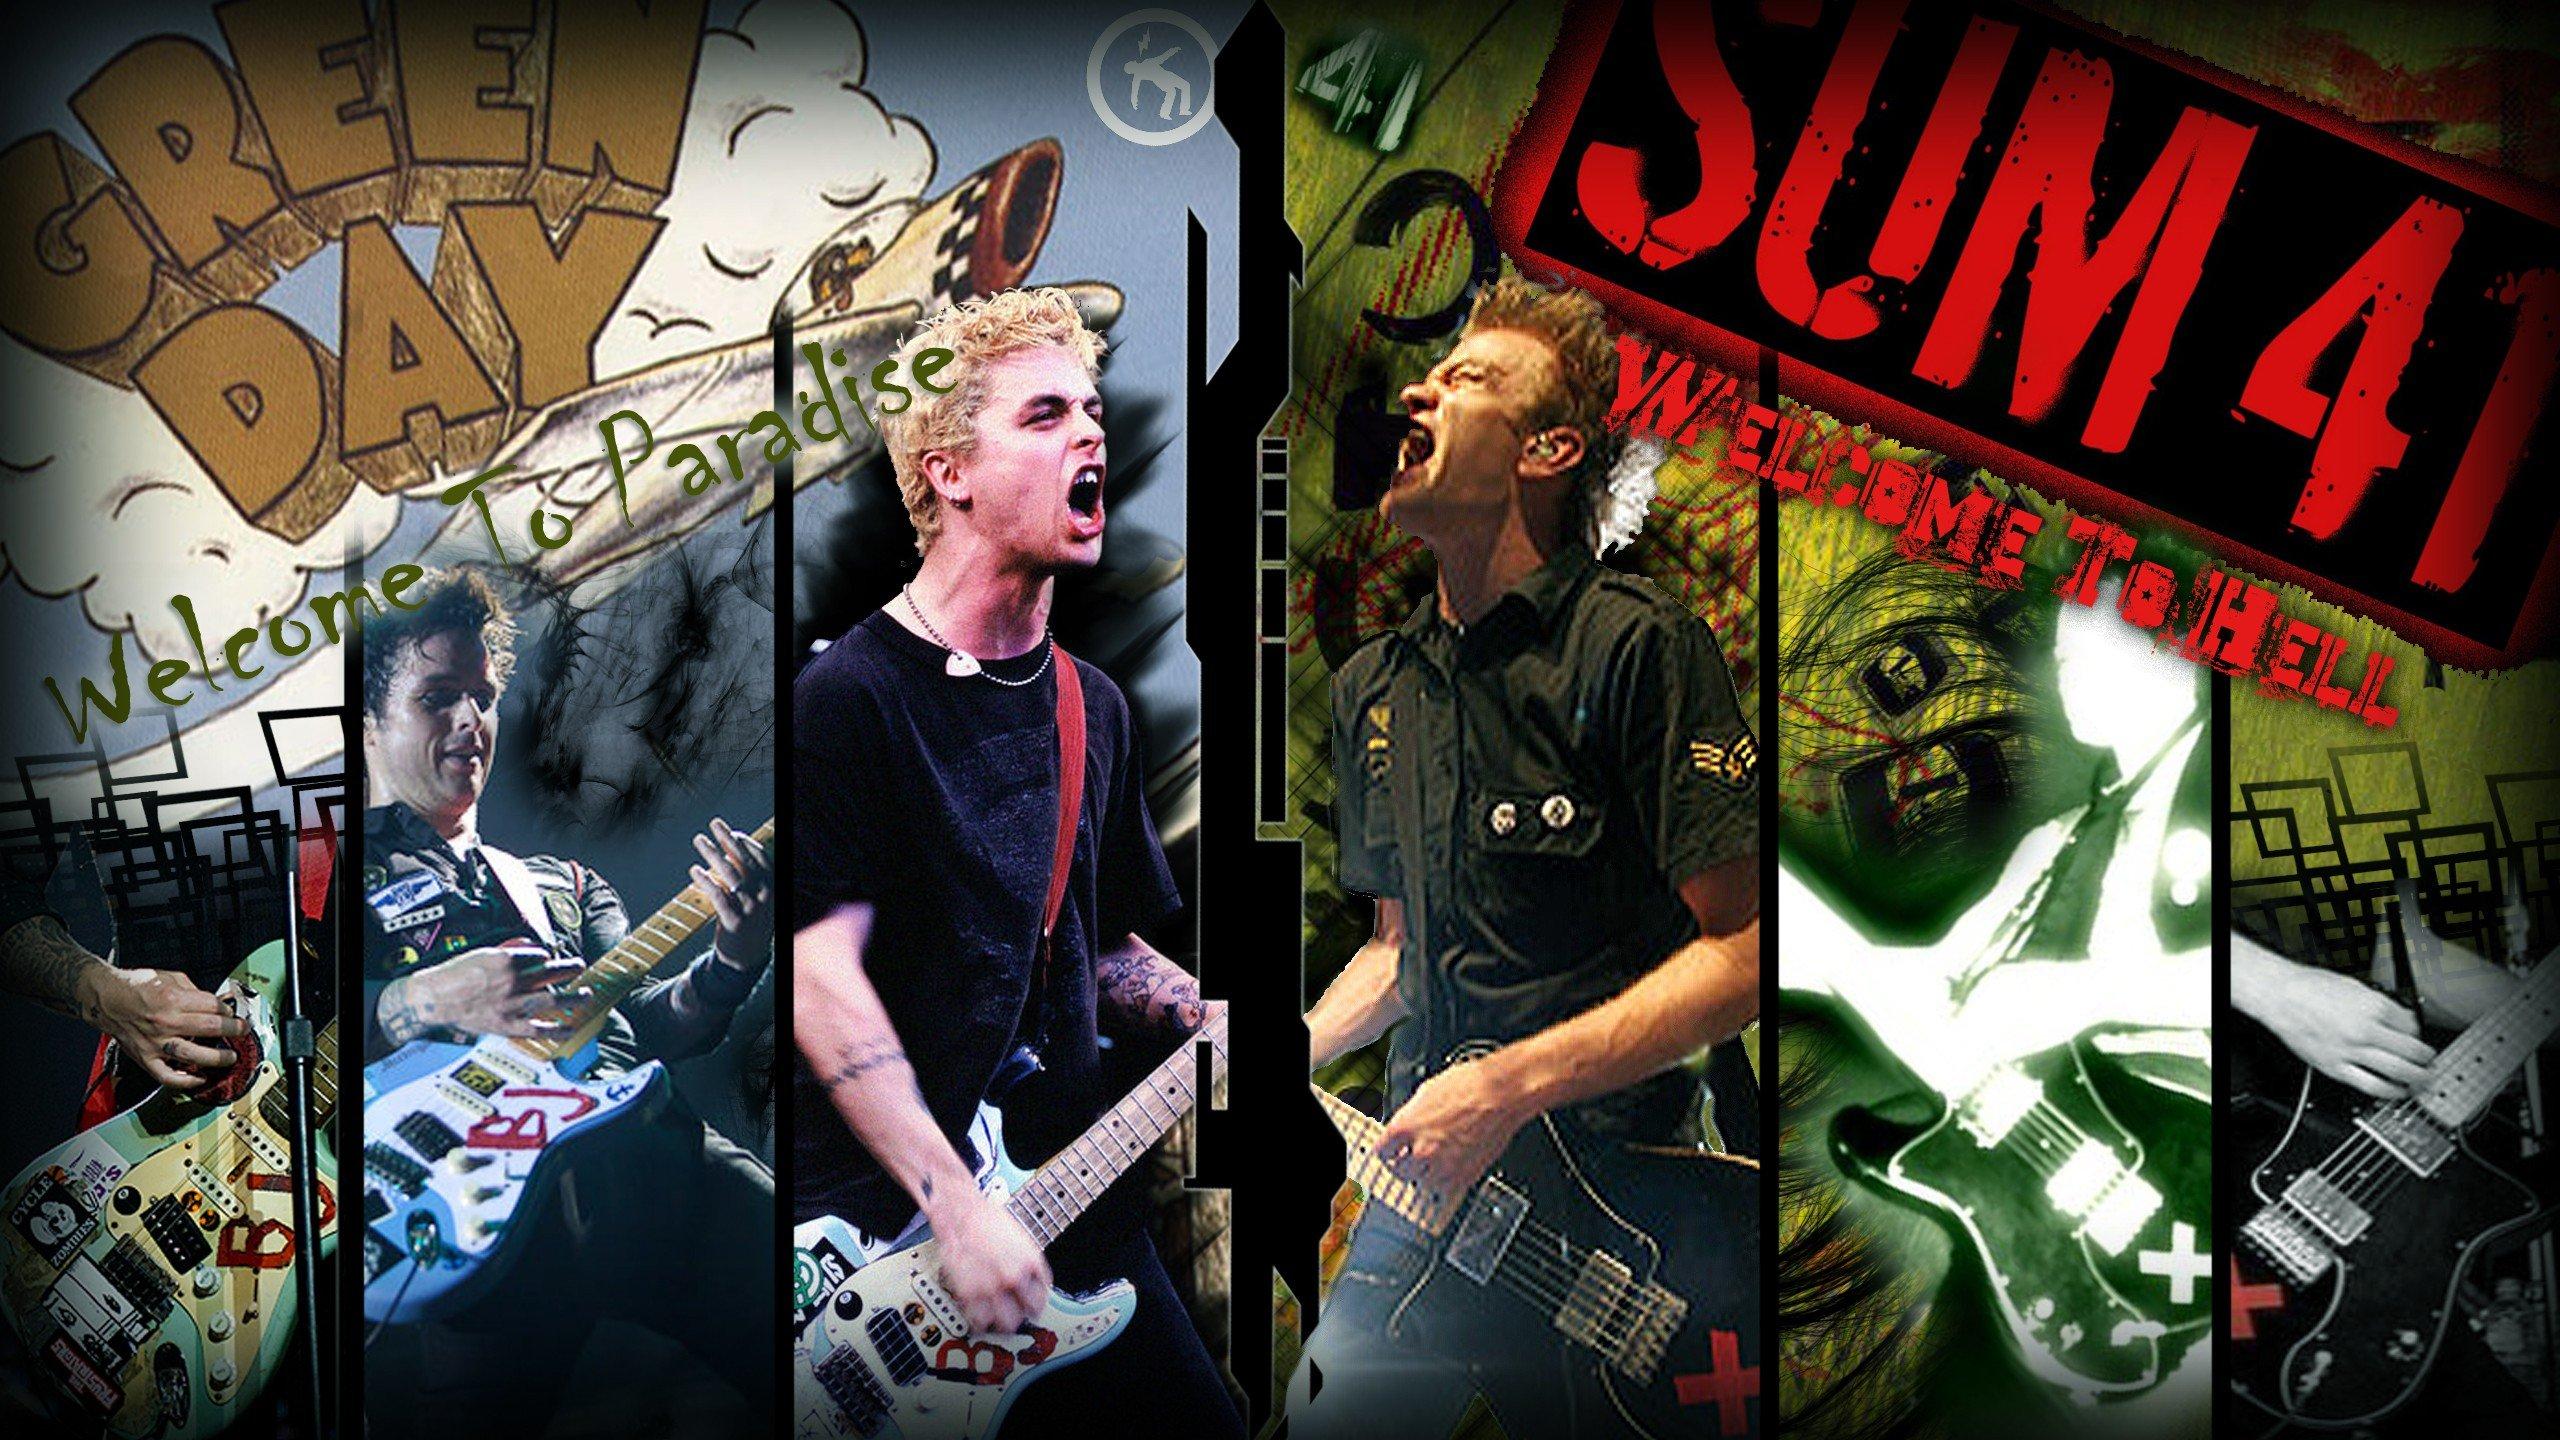 Sum 41 Wallpaper Hd Download Free Punk Rock Backgrounds Pixelstalk Net